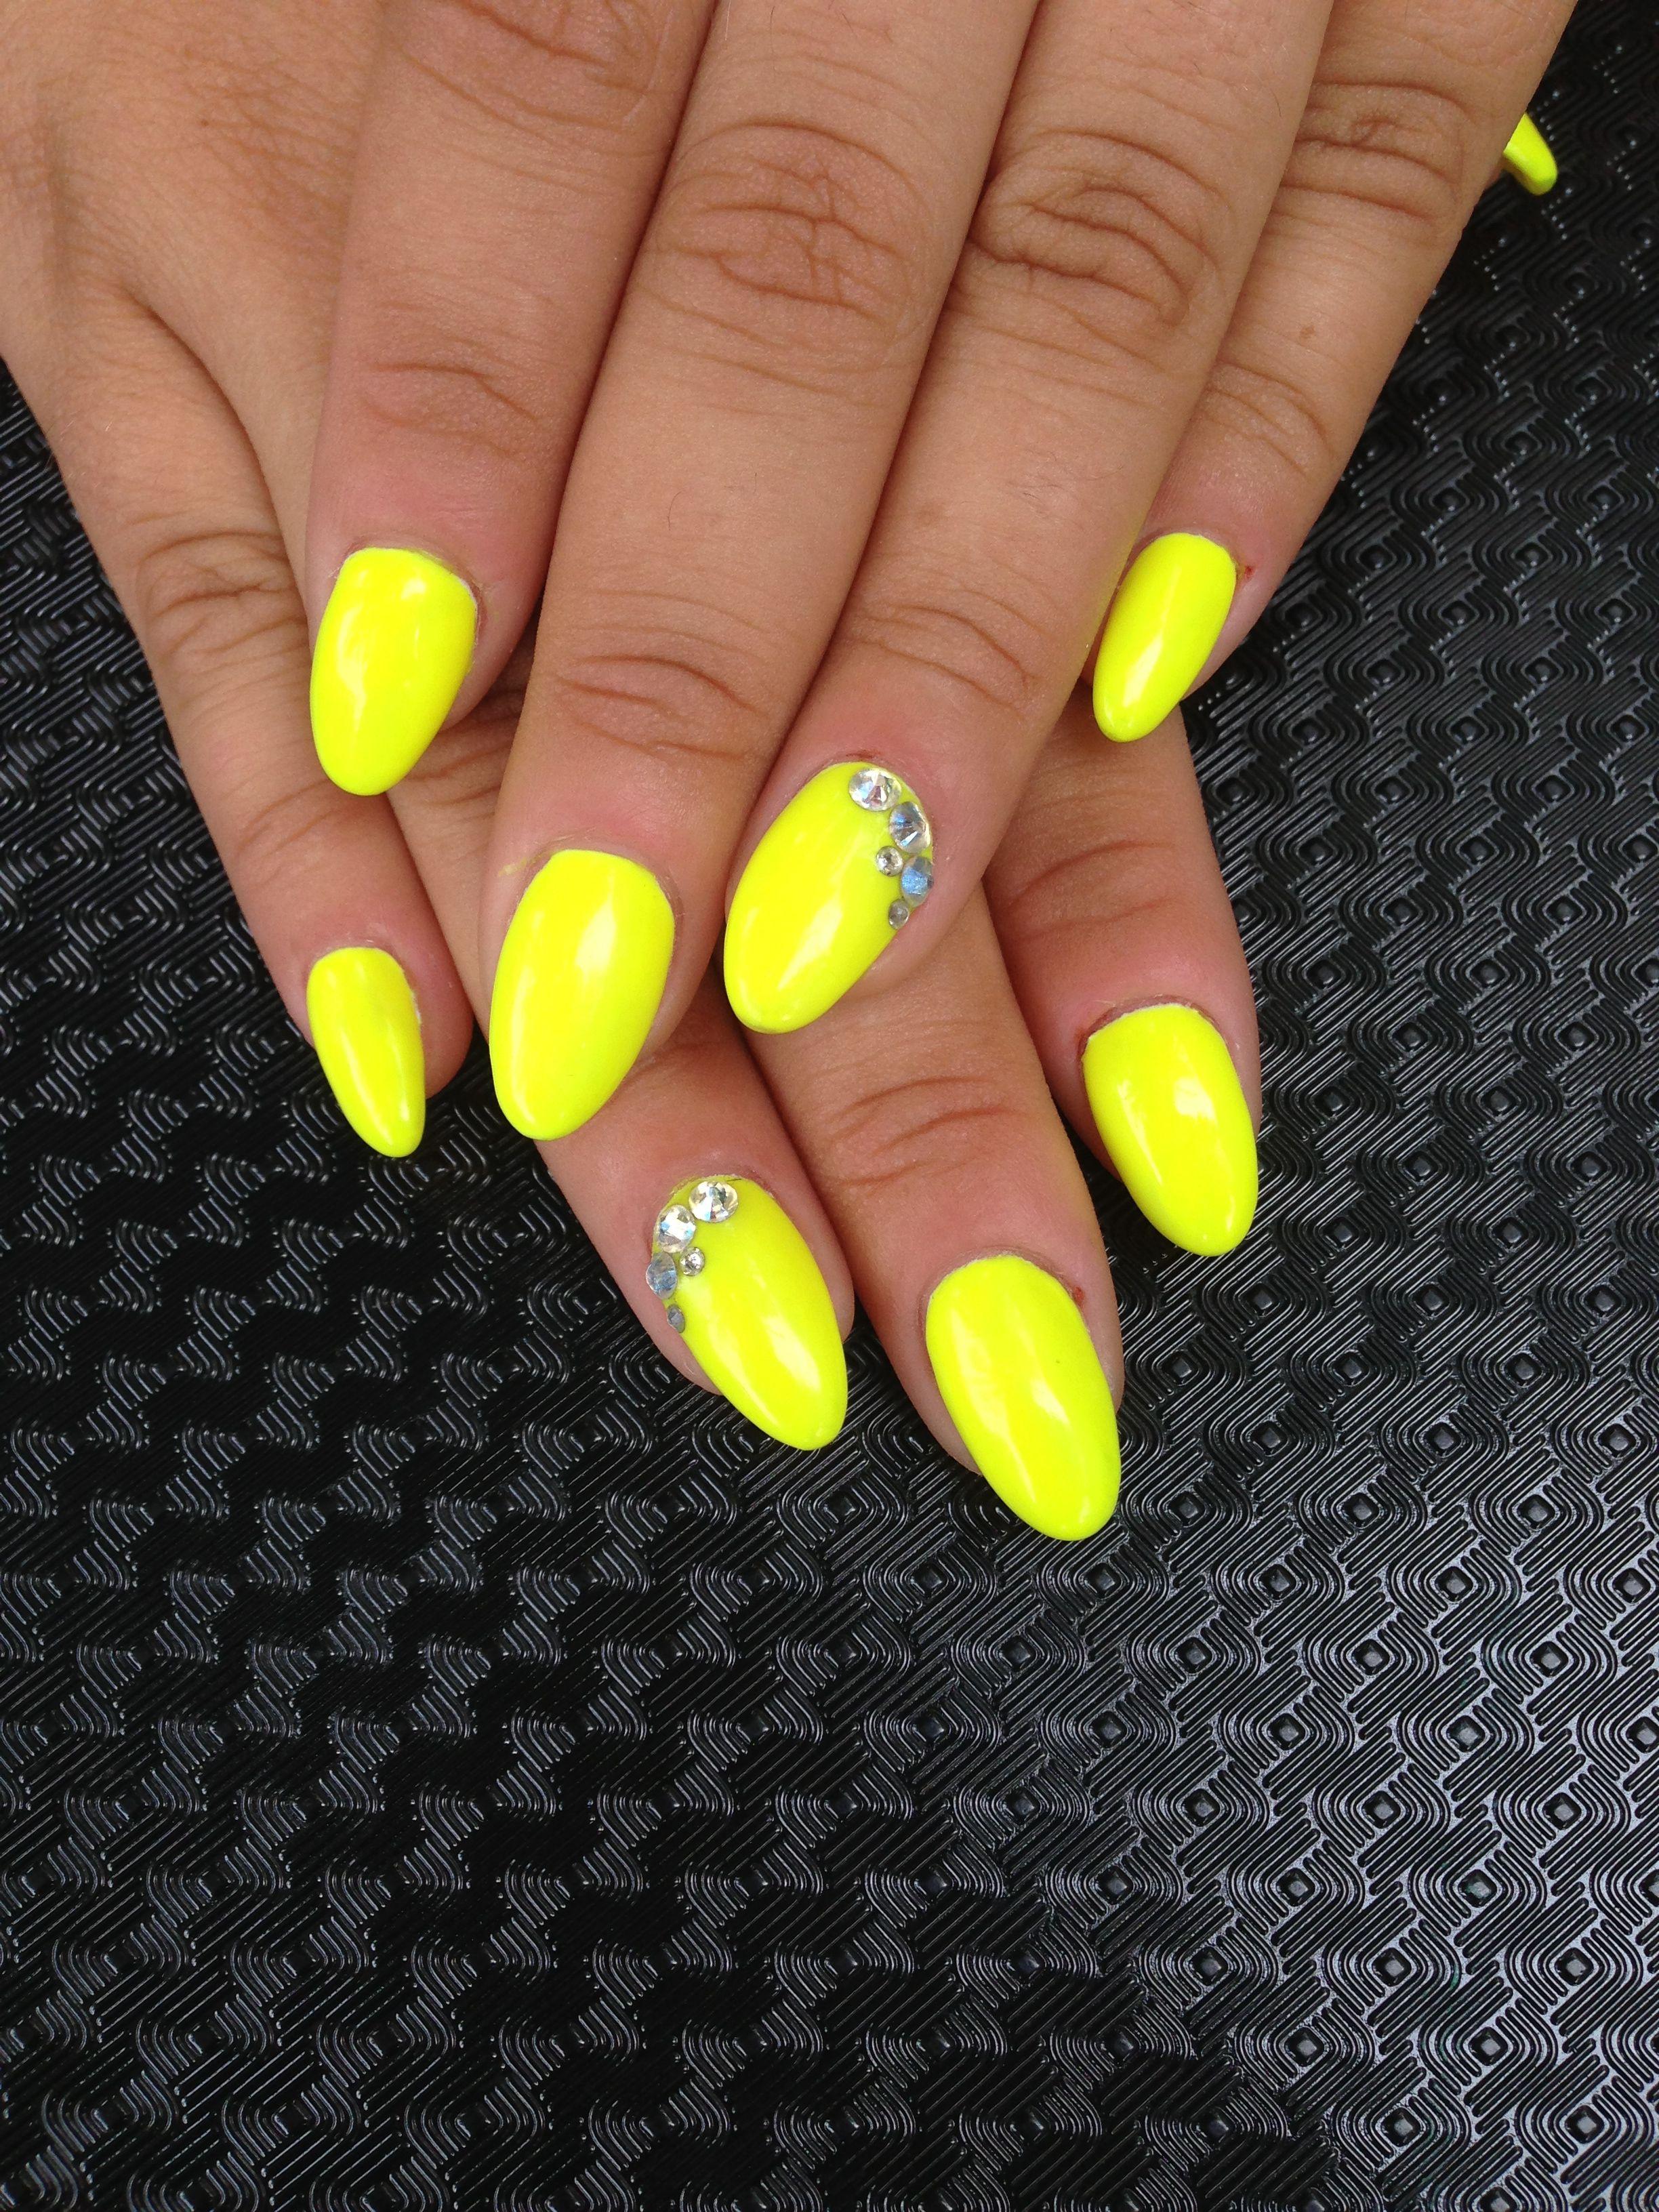 These are stiletto nails, neon yellow with Swarovski crystal detail ...